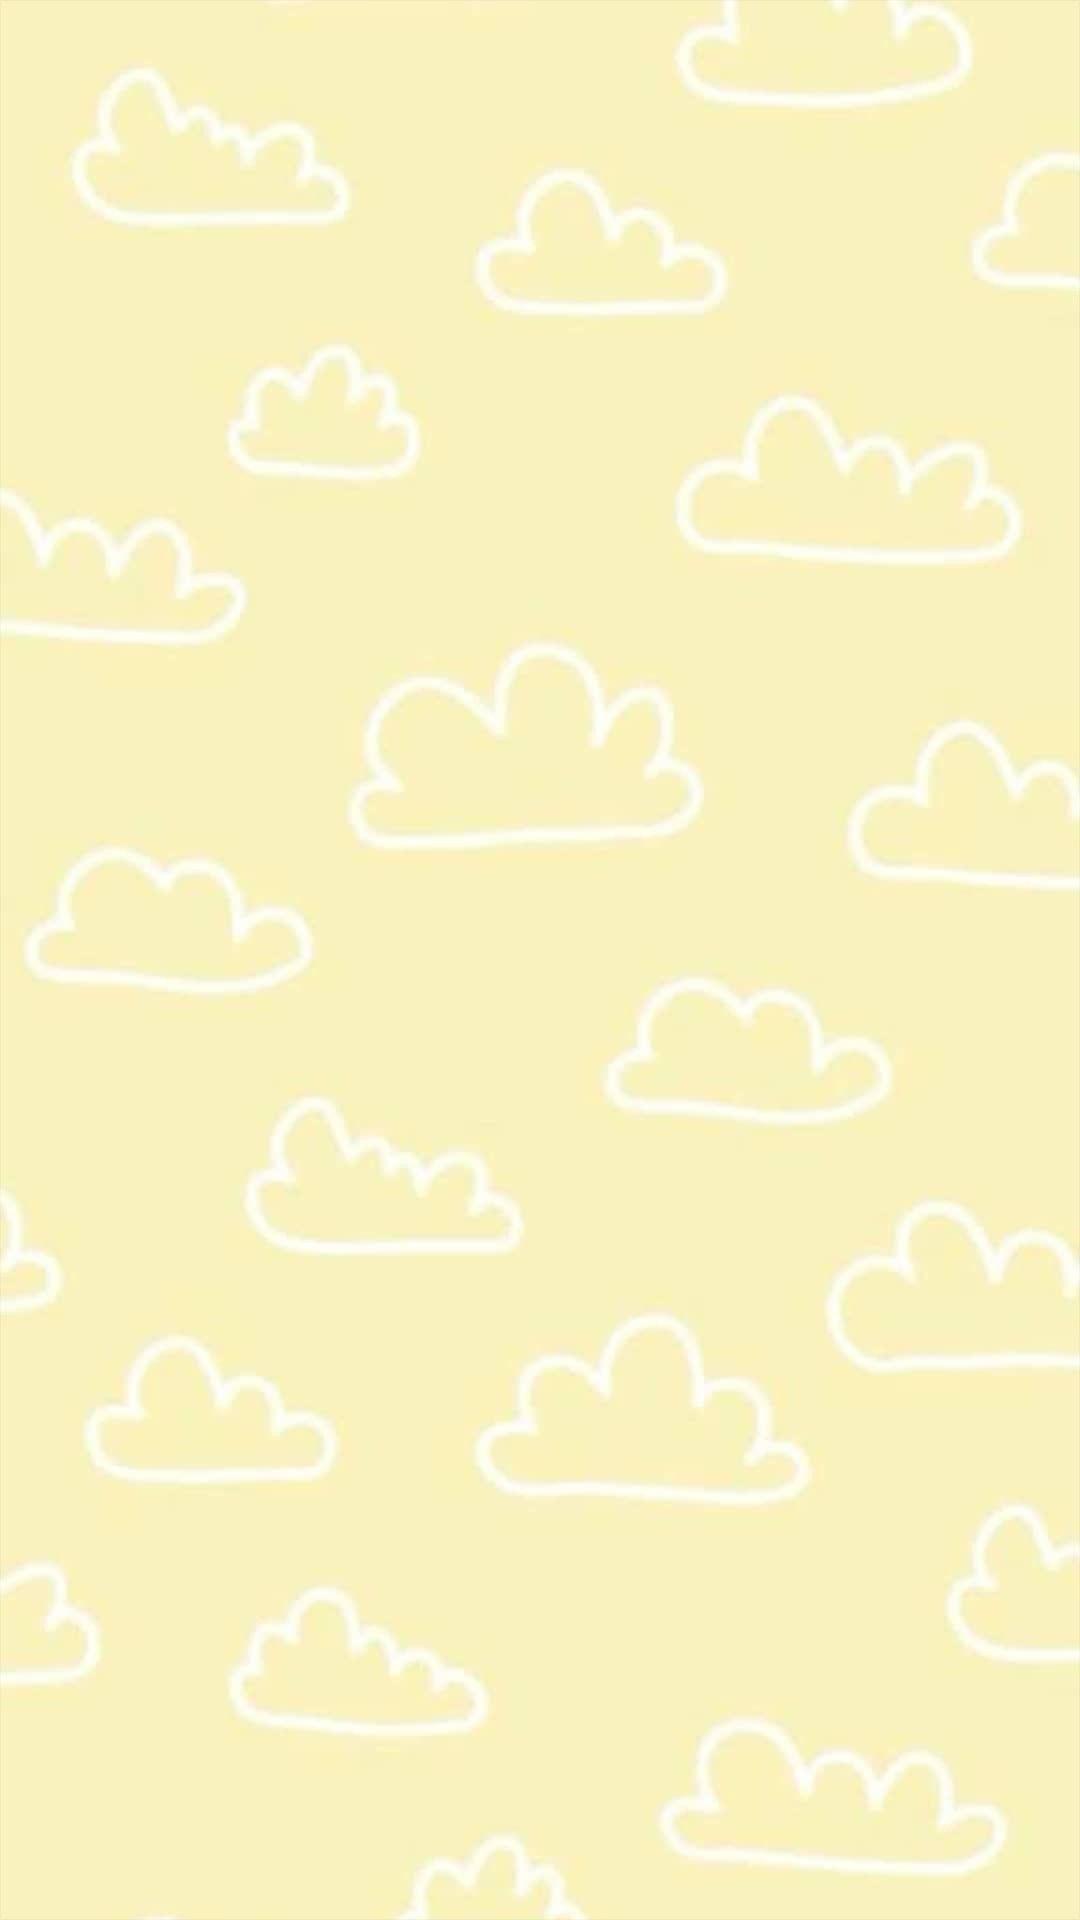 Cute Aesthetic Patterns : aesthetic, patterns, Aesthetic, Pattern, Wallpapers, Backgrounds, WallpaperAccess